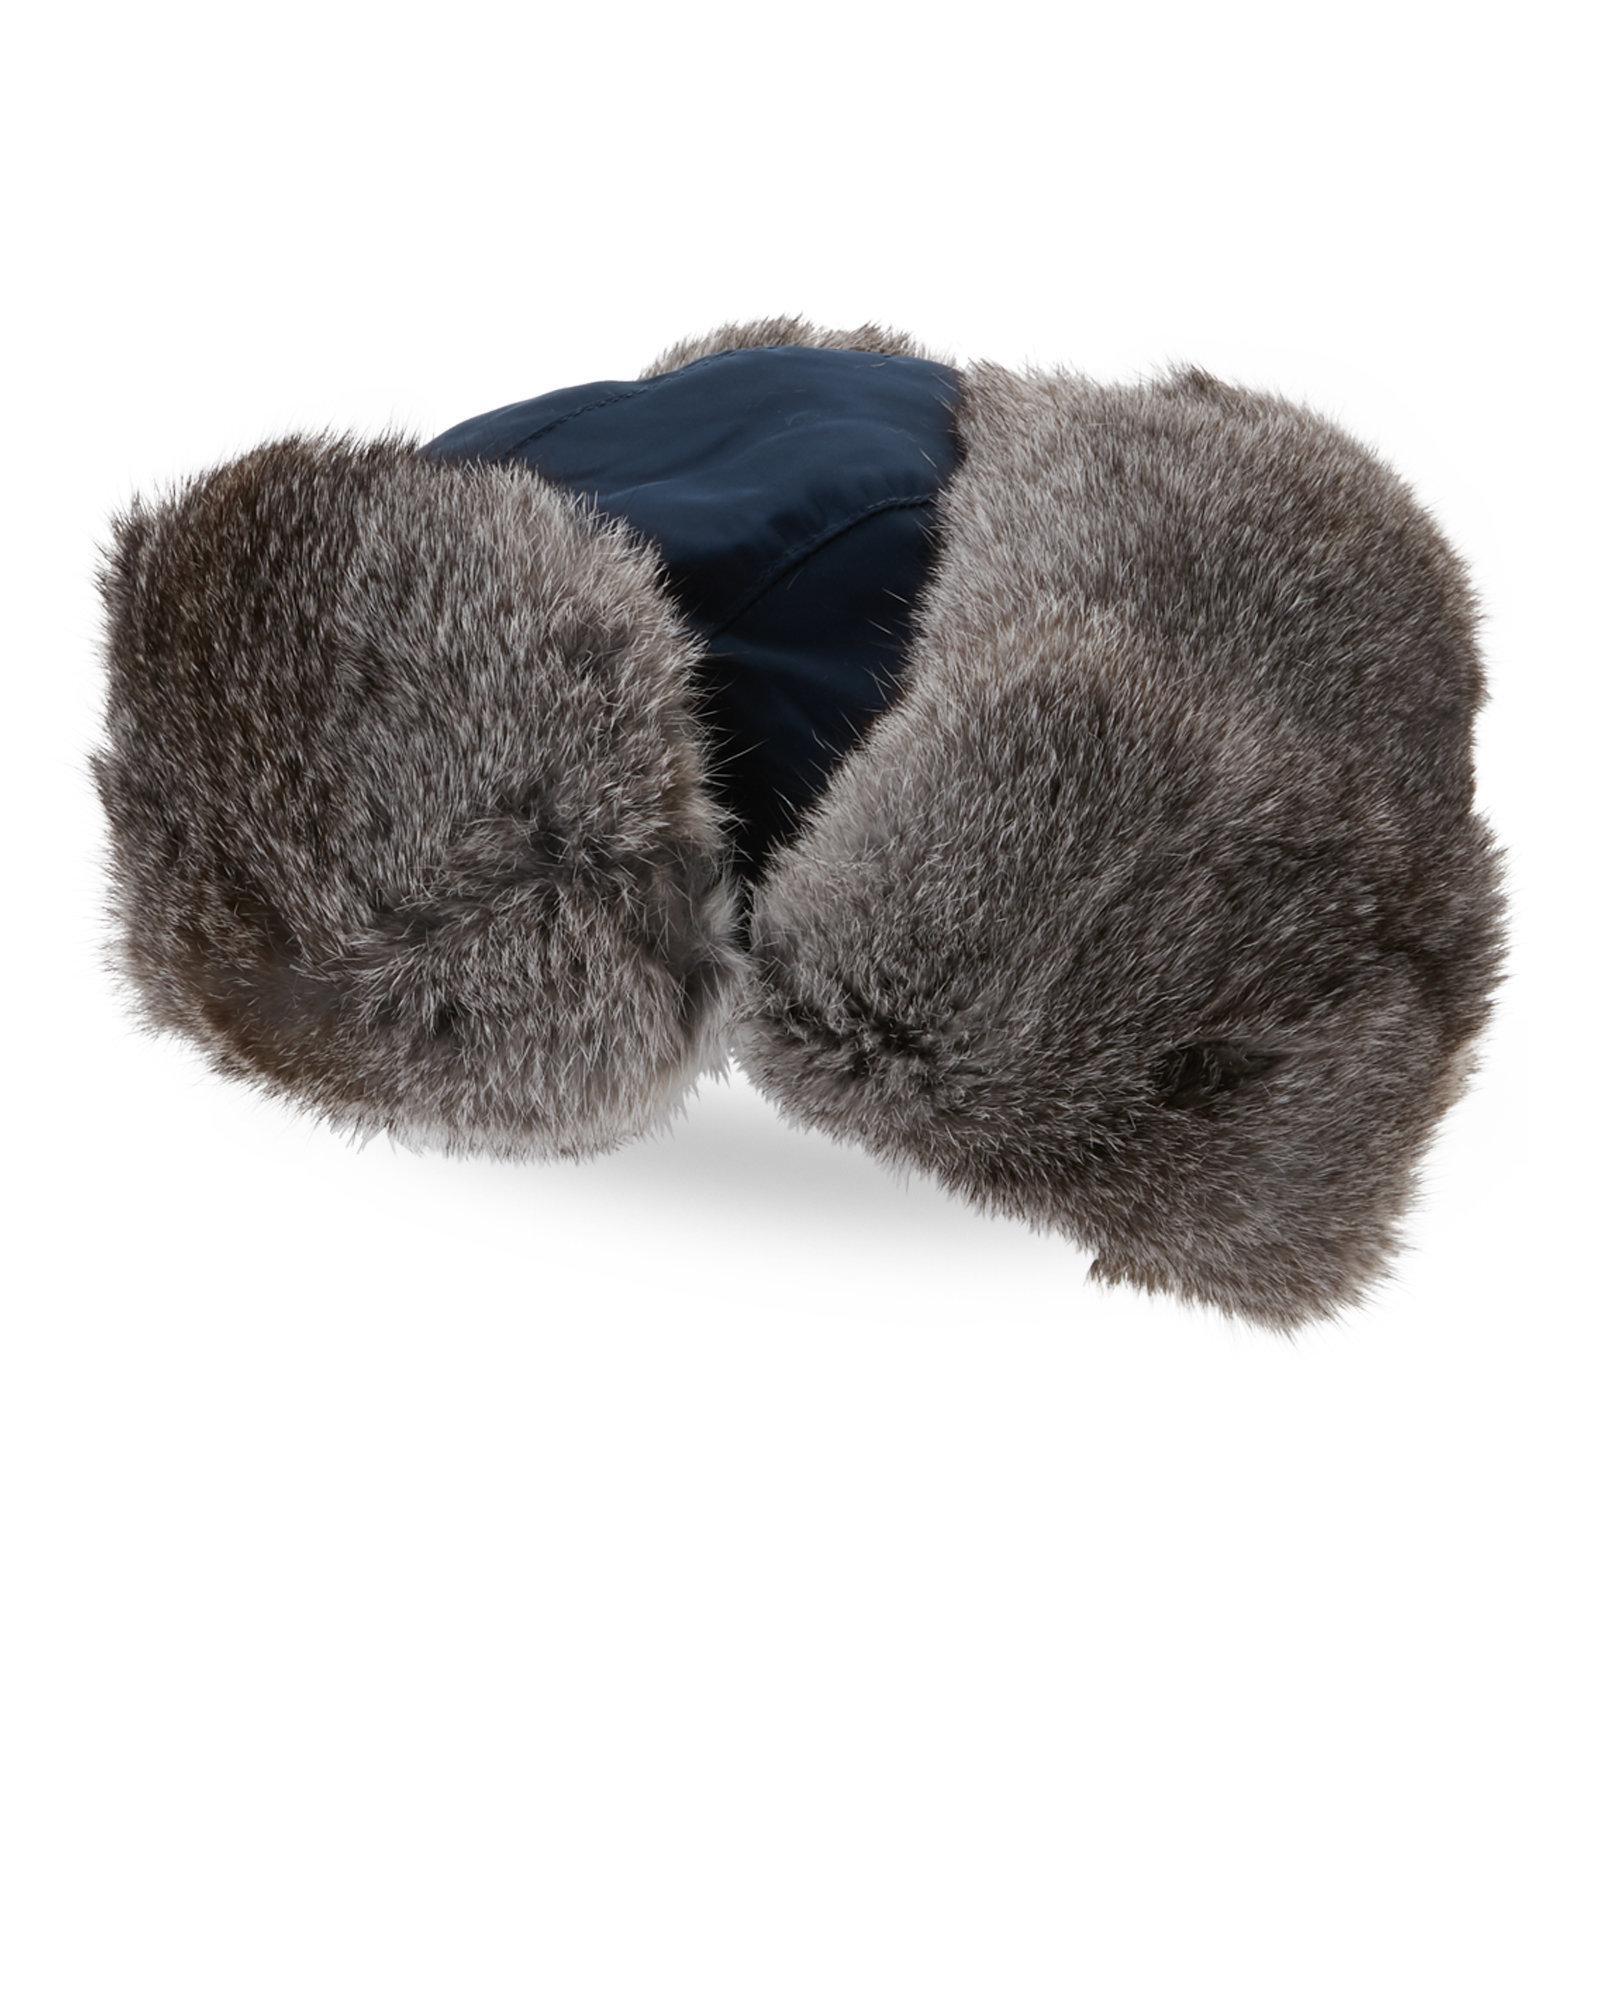 5db39daedb6d4 Lyst - Crown Cap Real Rabbit Fur Lined Bomber Hat in Gray for Men